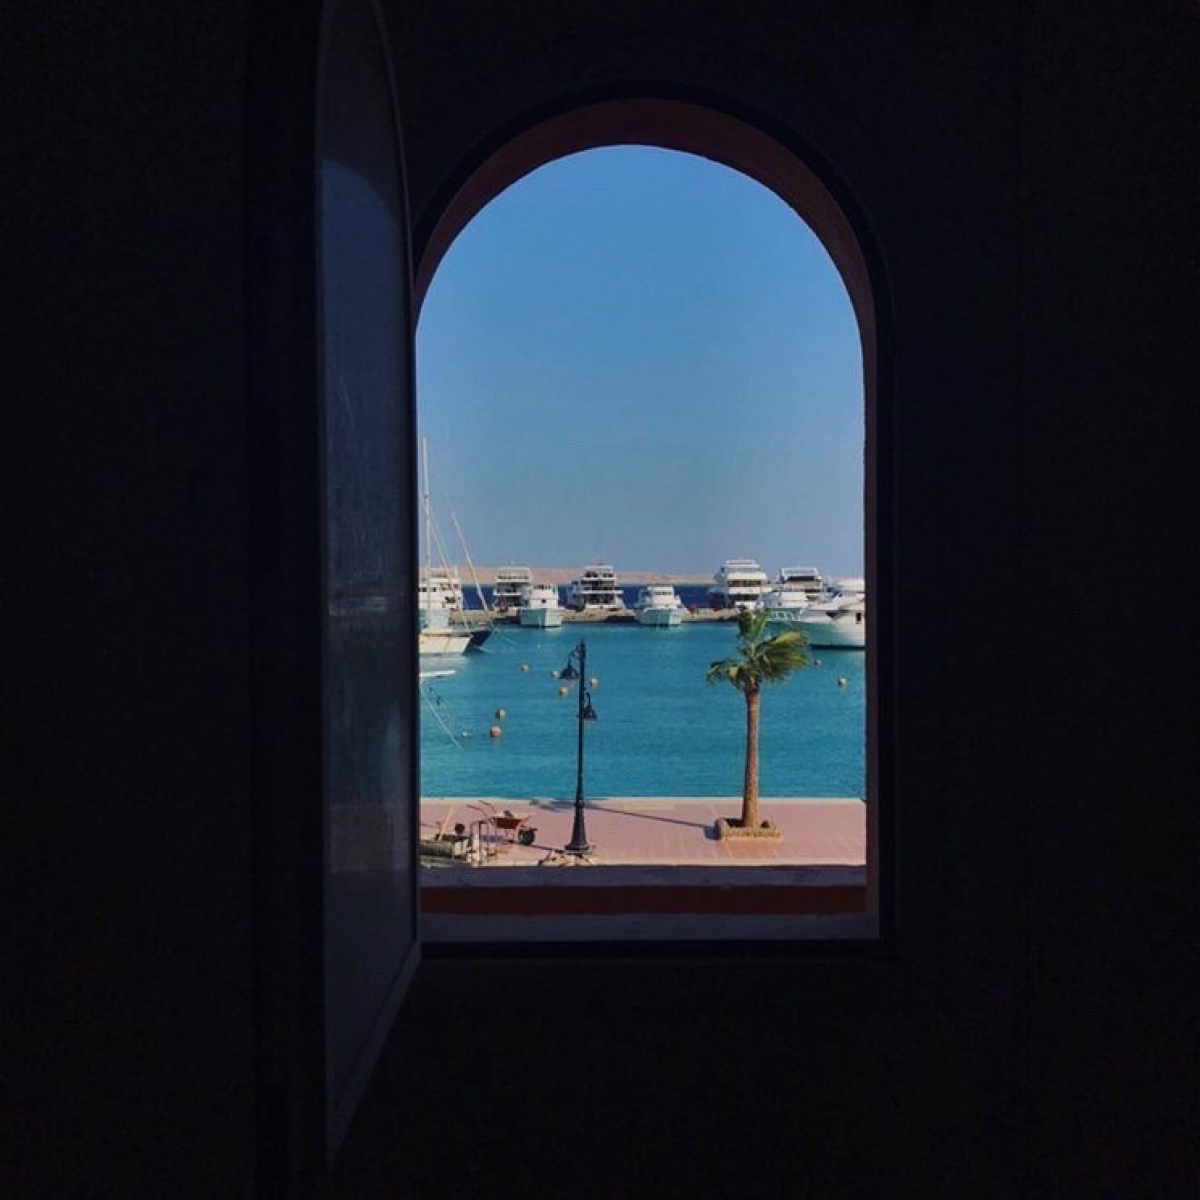 Khung cửa sổ tại New Marina, Hurghada, Ai Cập.Nguồn: windowswap